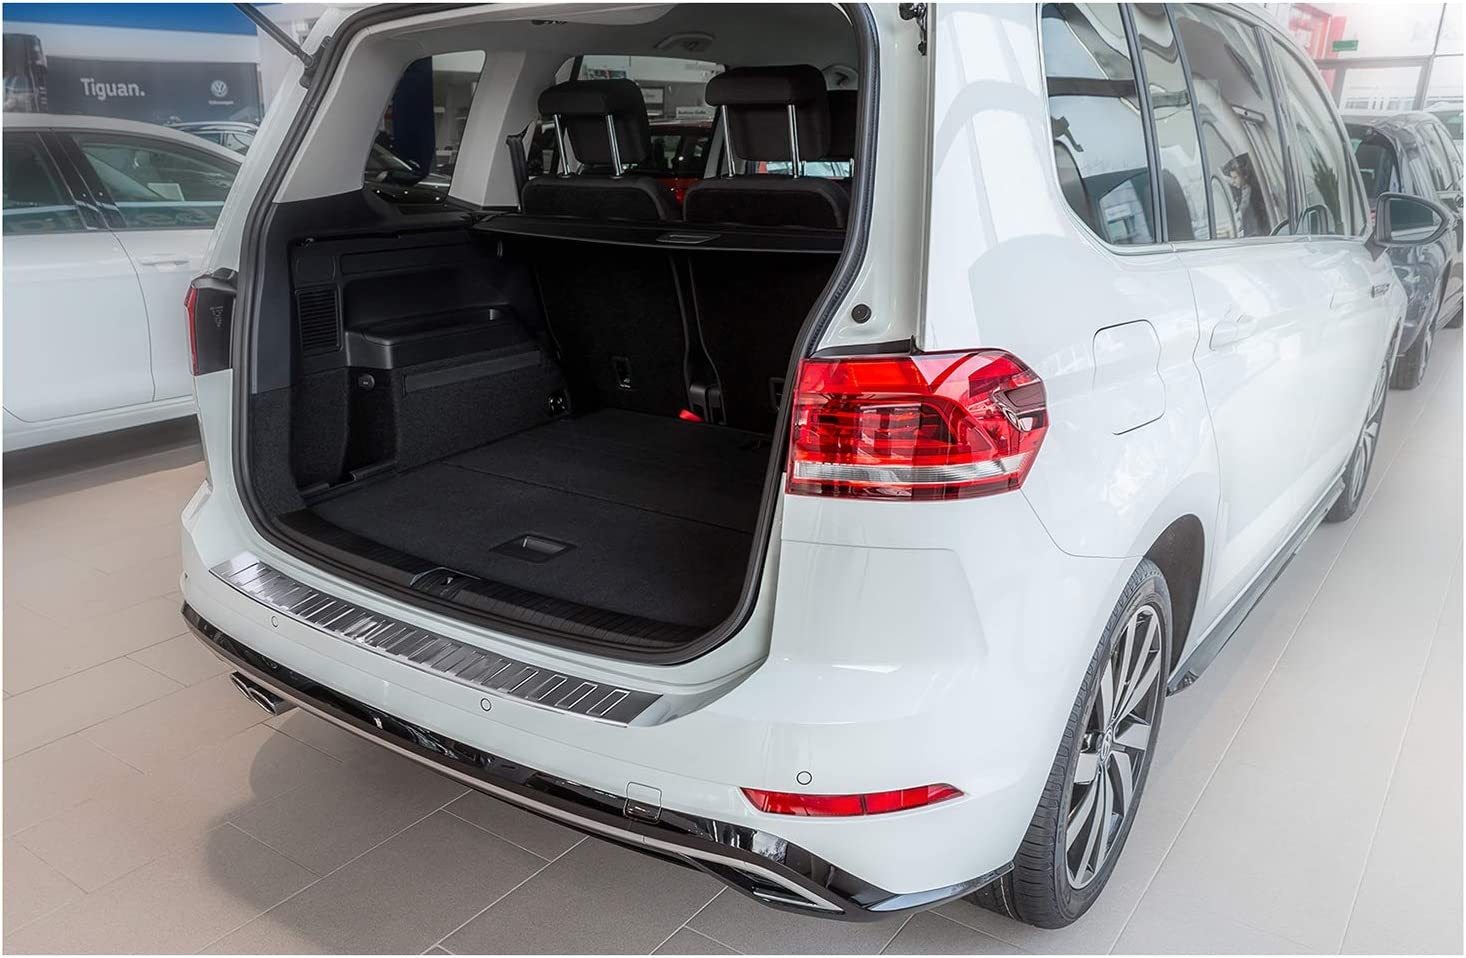 Teileplus24 Al103 Ladekantenschutz Aluminium Für Vw Touran 2 5t 2015 Farbe Silber Auto